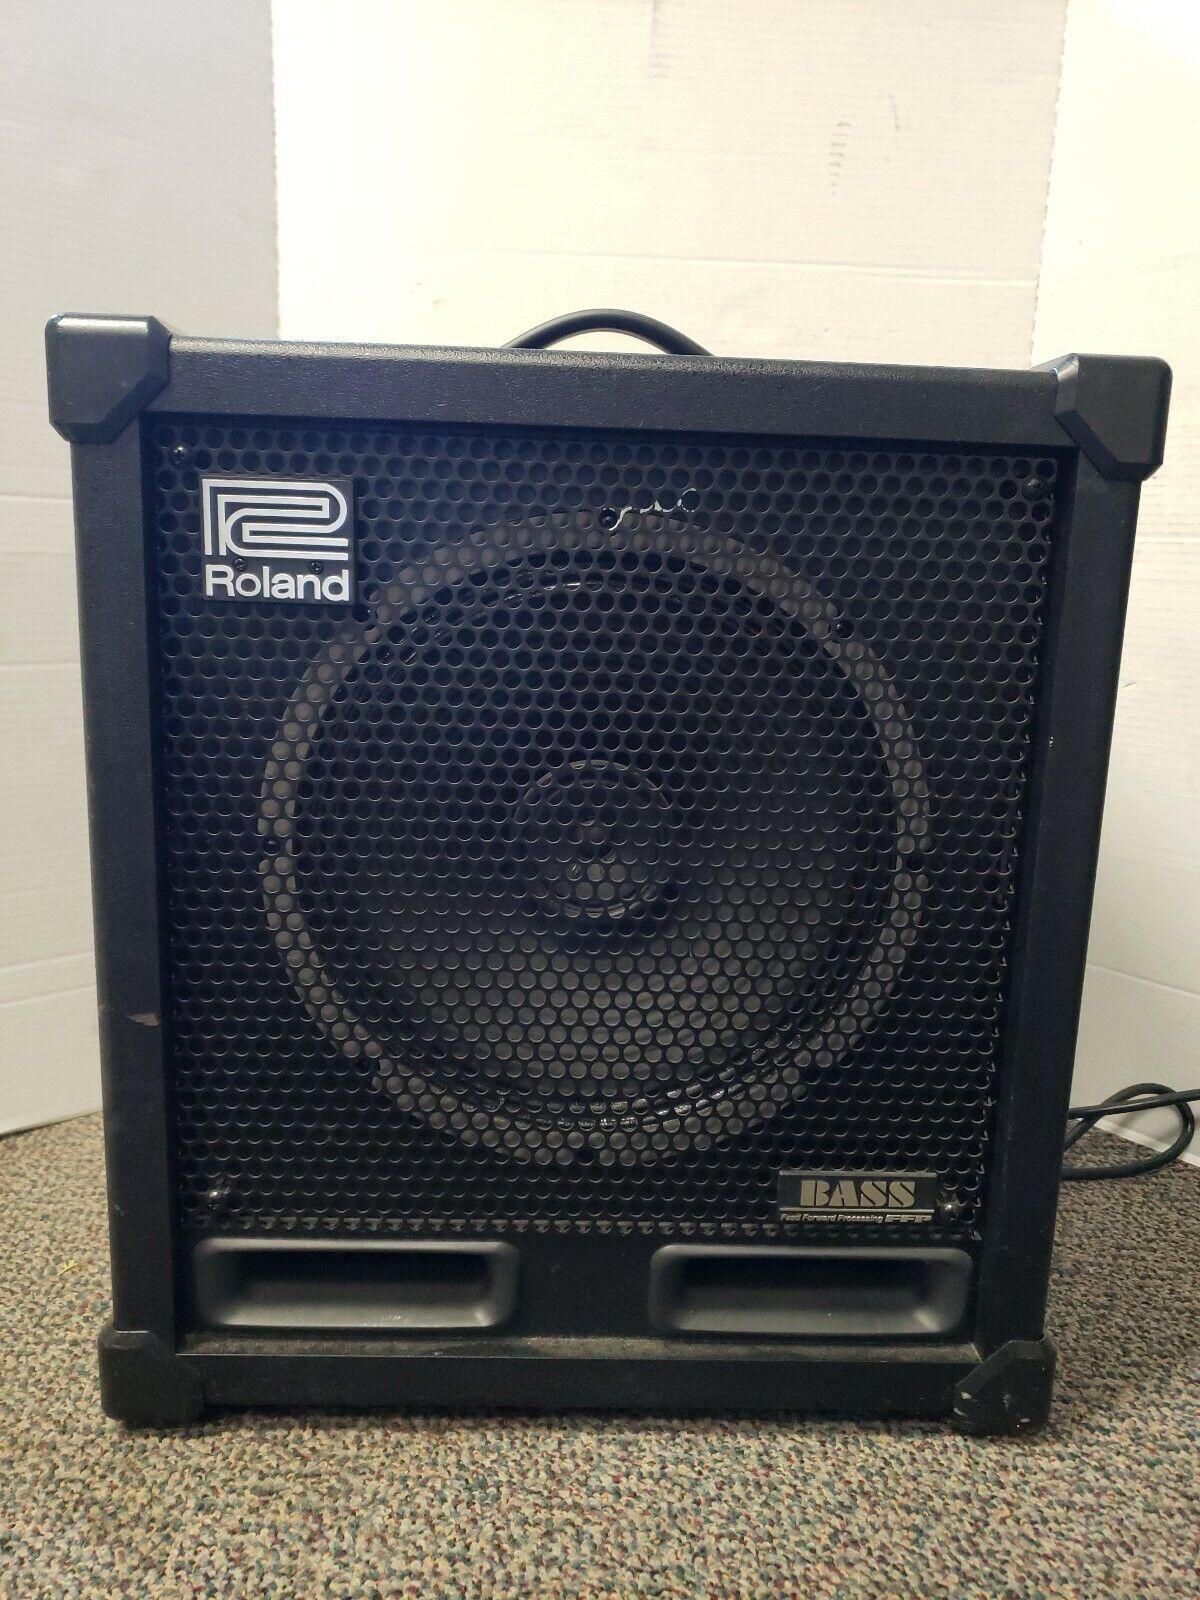 Roland 120W Bass Amp CB-120XL c-x